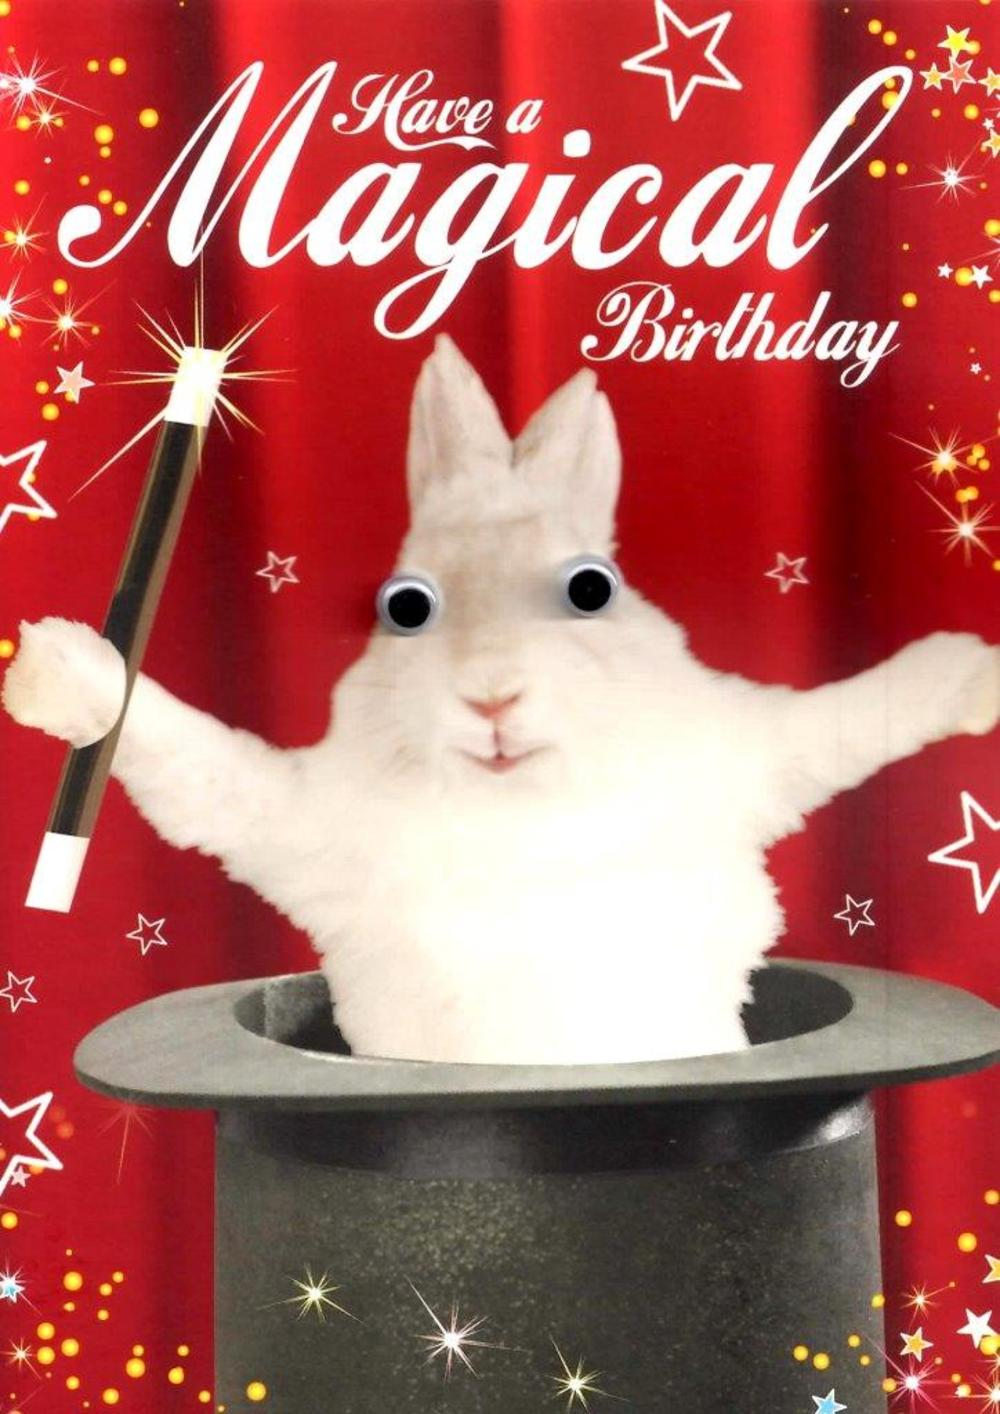 White Rabbit Googlies Magical Birthday Card